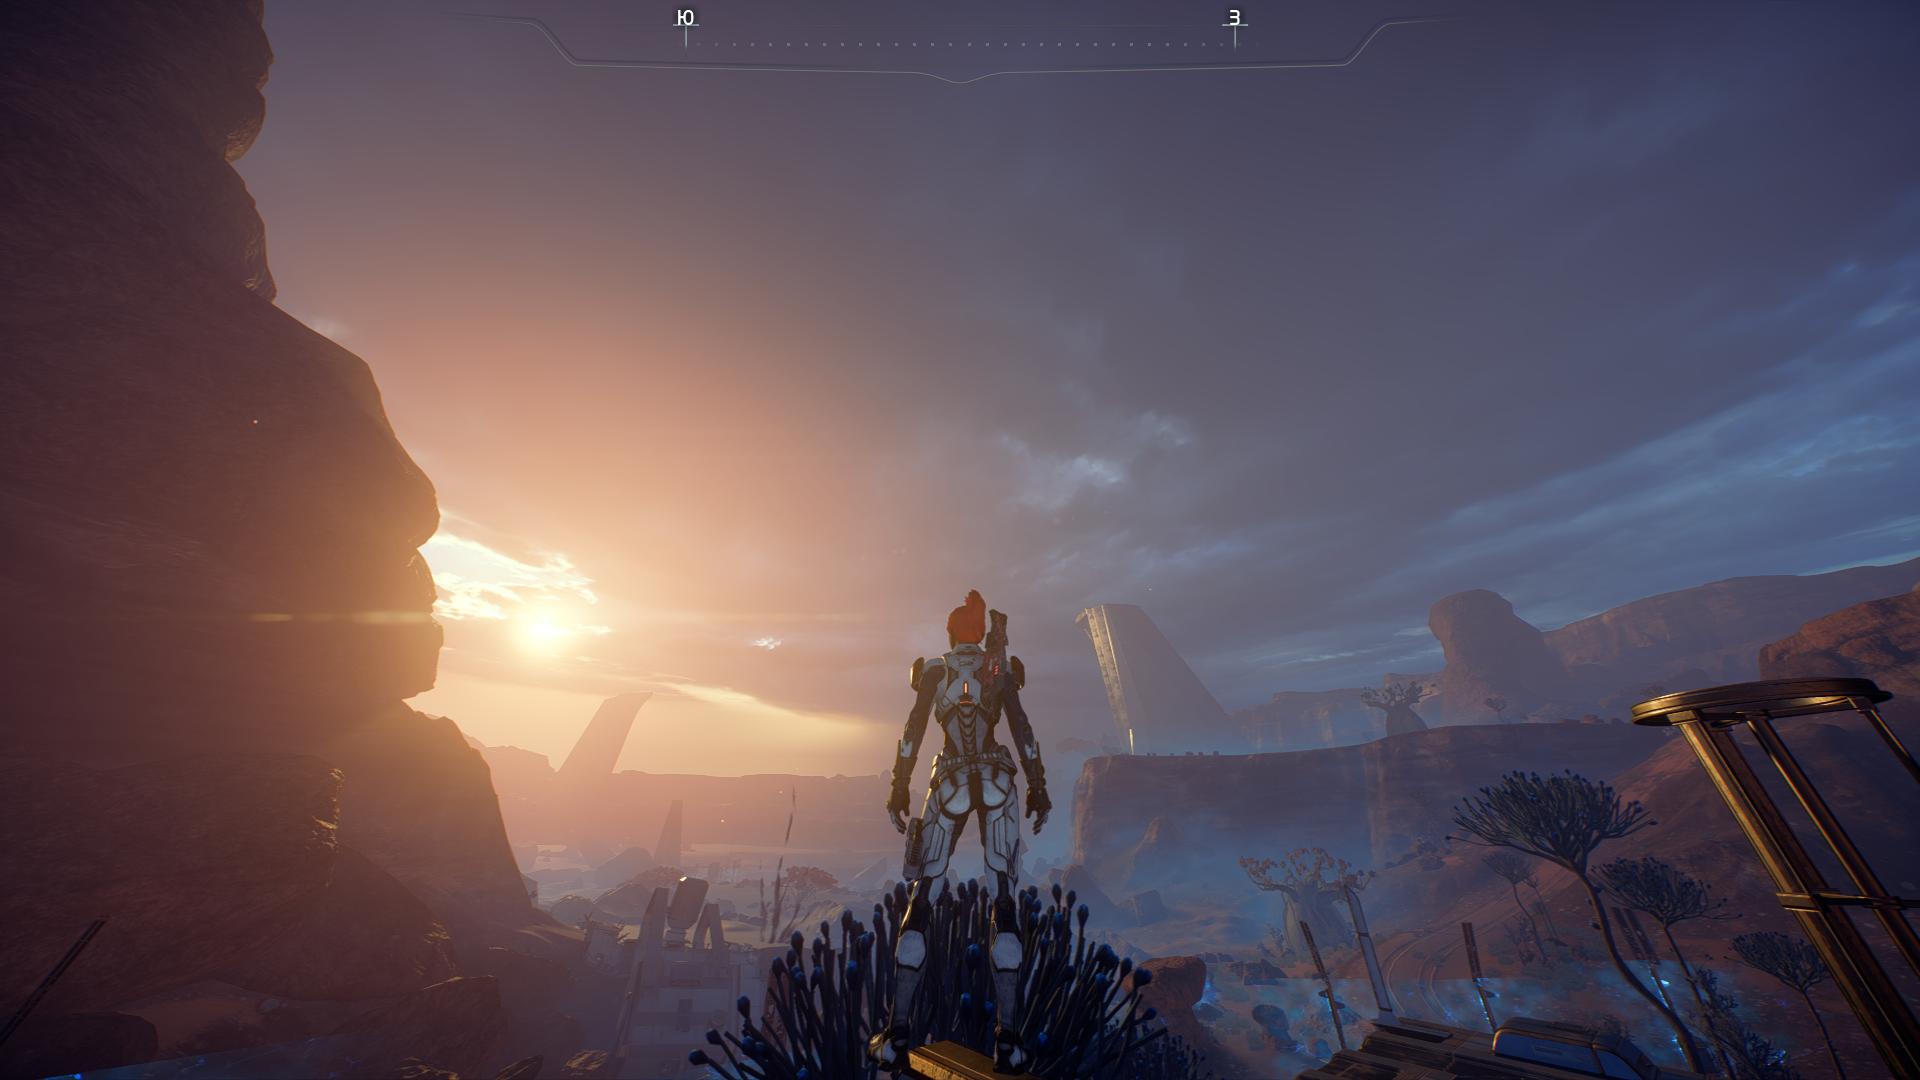 Mass Effect Andromeda 04.09.2017 - 15.40.32.05.png - Mass Effect: Andromeda